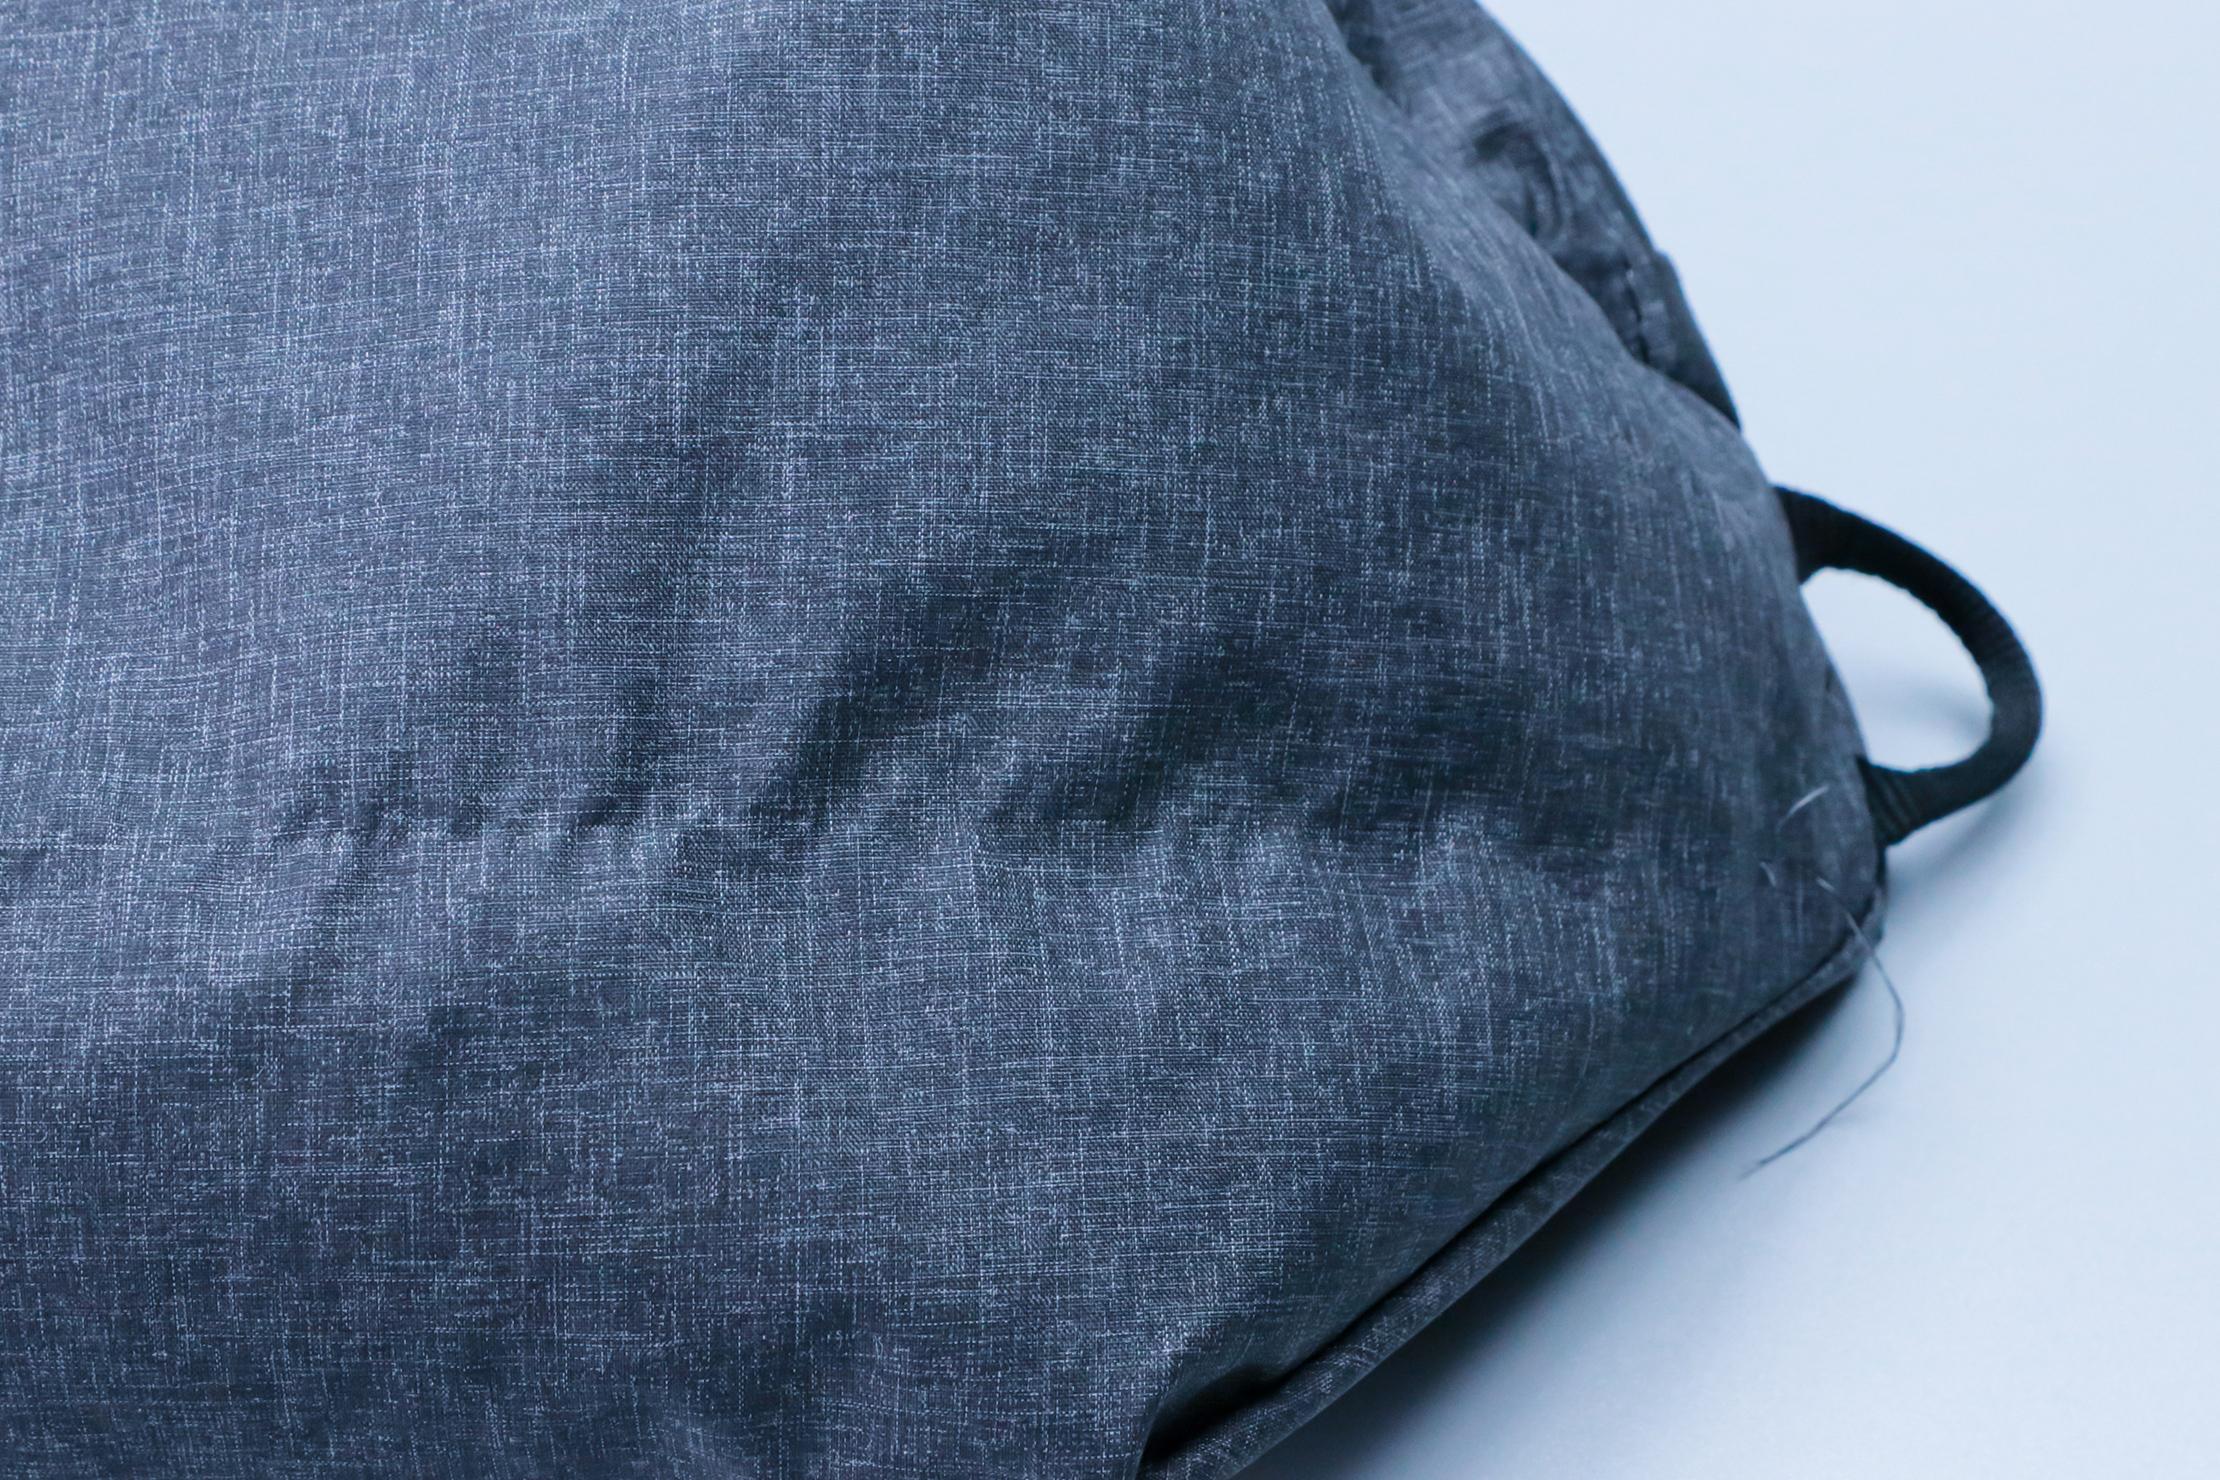 Peak Design Shoe Pouch loose thread